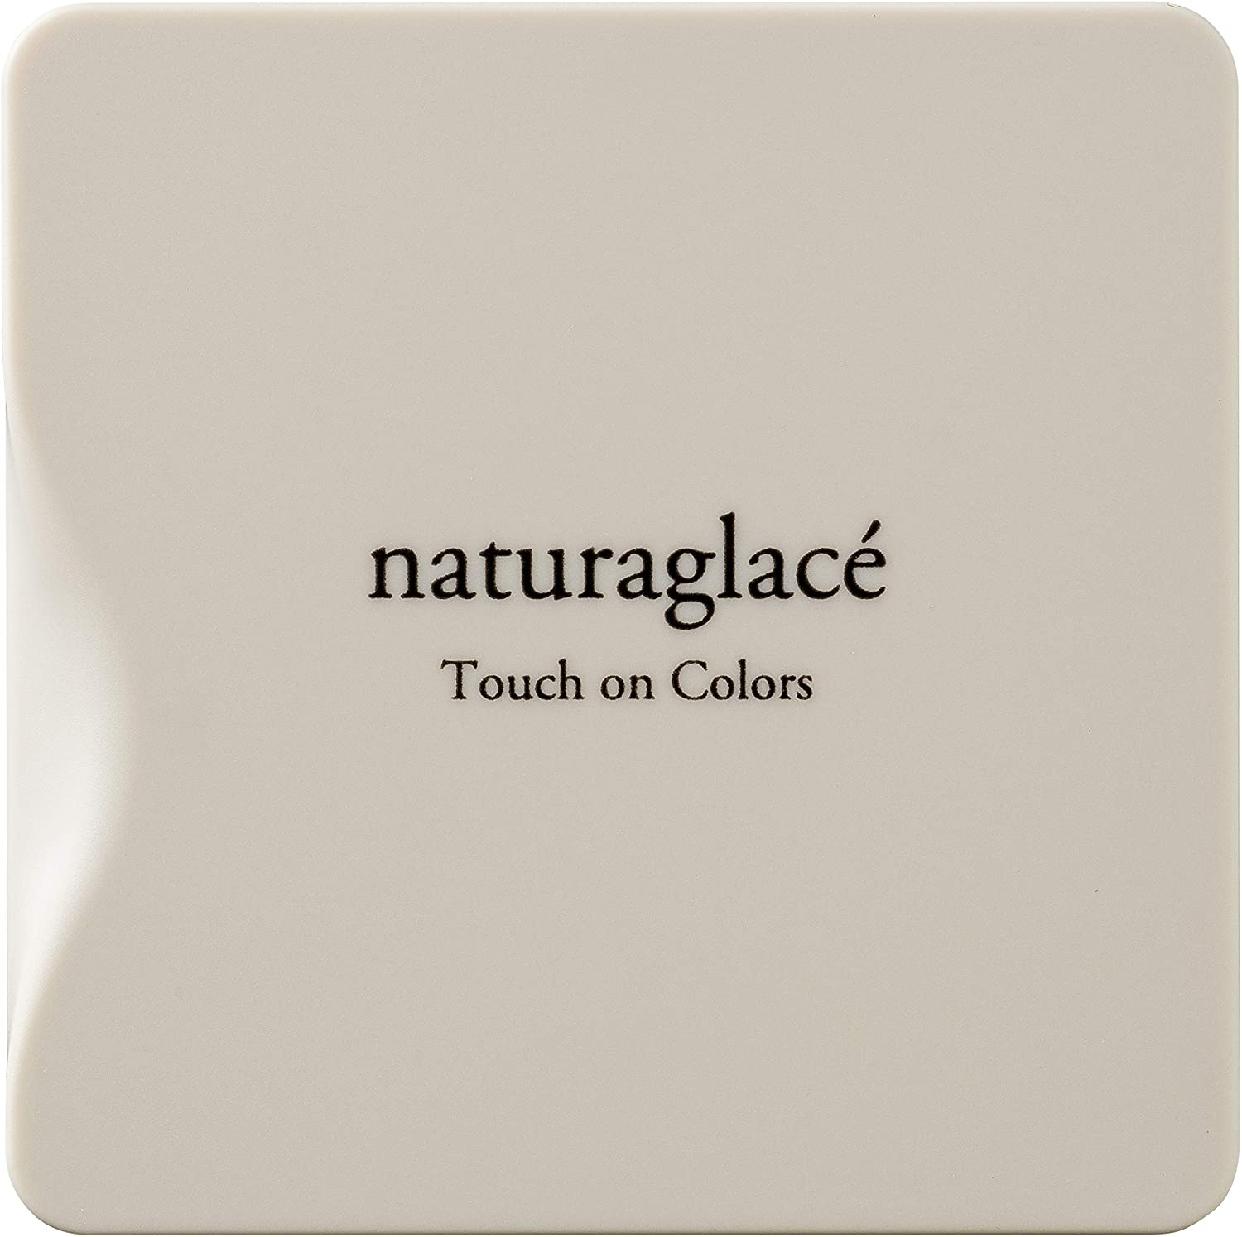 naturaglacé(ナチュラグラッセ)タッチオンカラーズ (カラー)の商品画像3